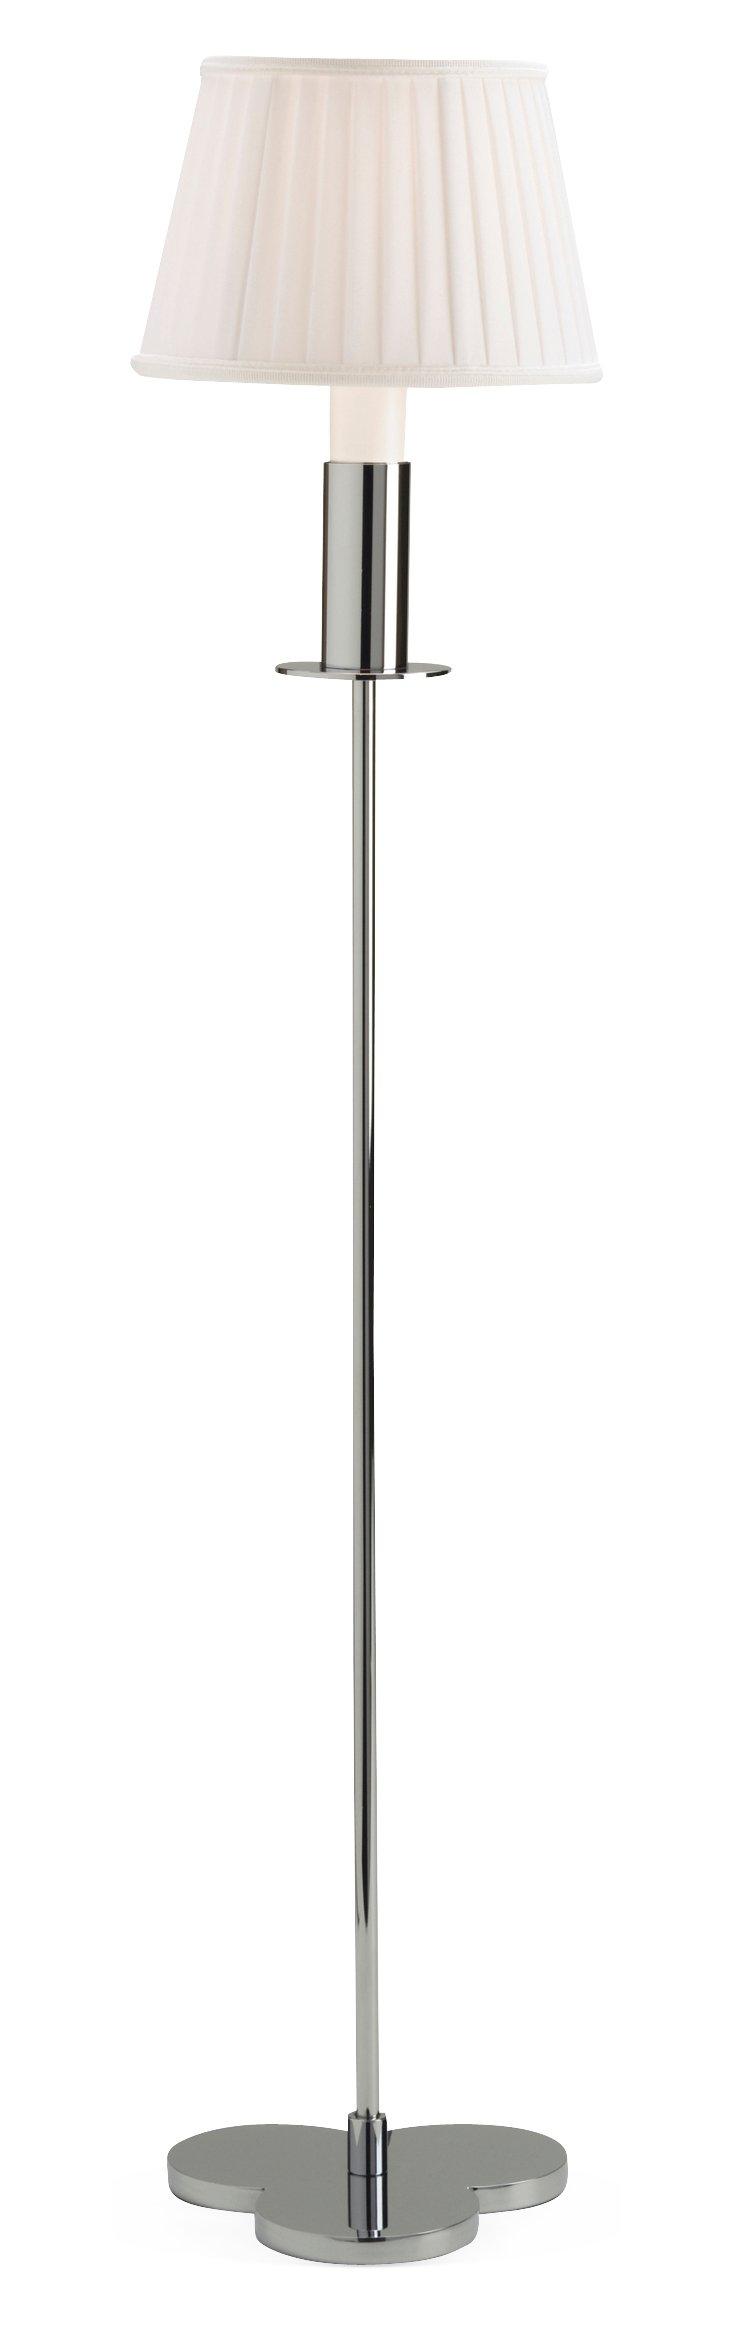 Petite Champs 33'' Table Lamp, Chrome